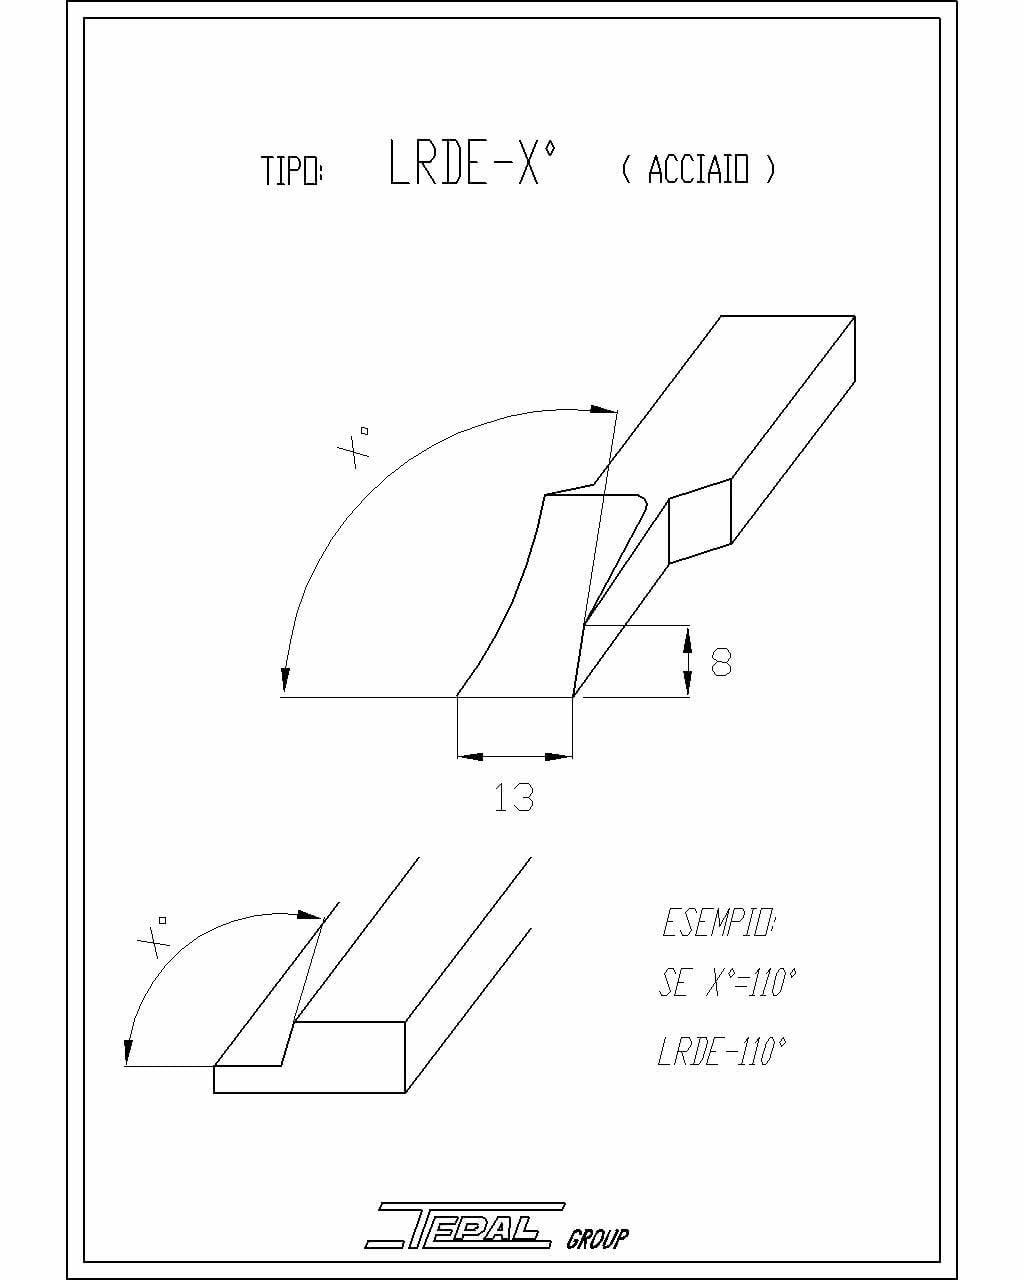 LRDE-X